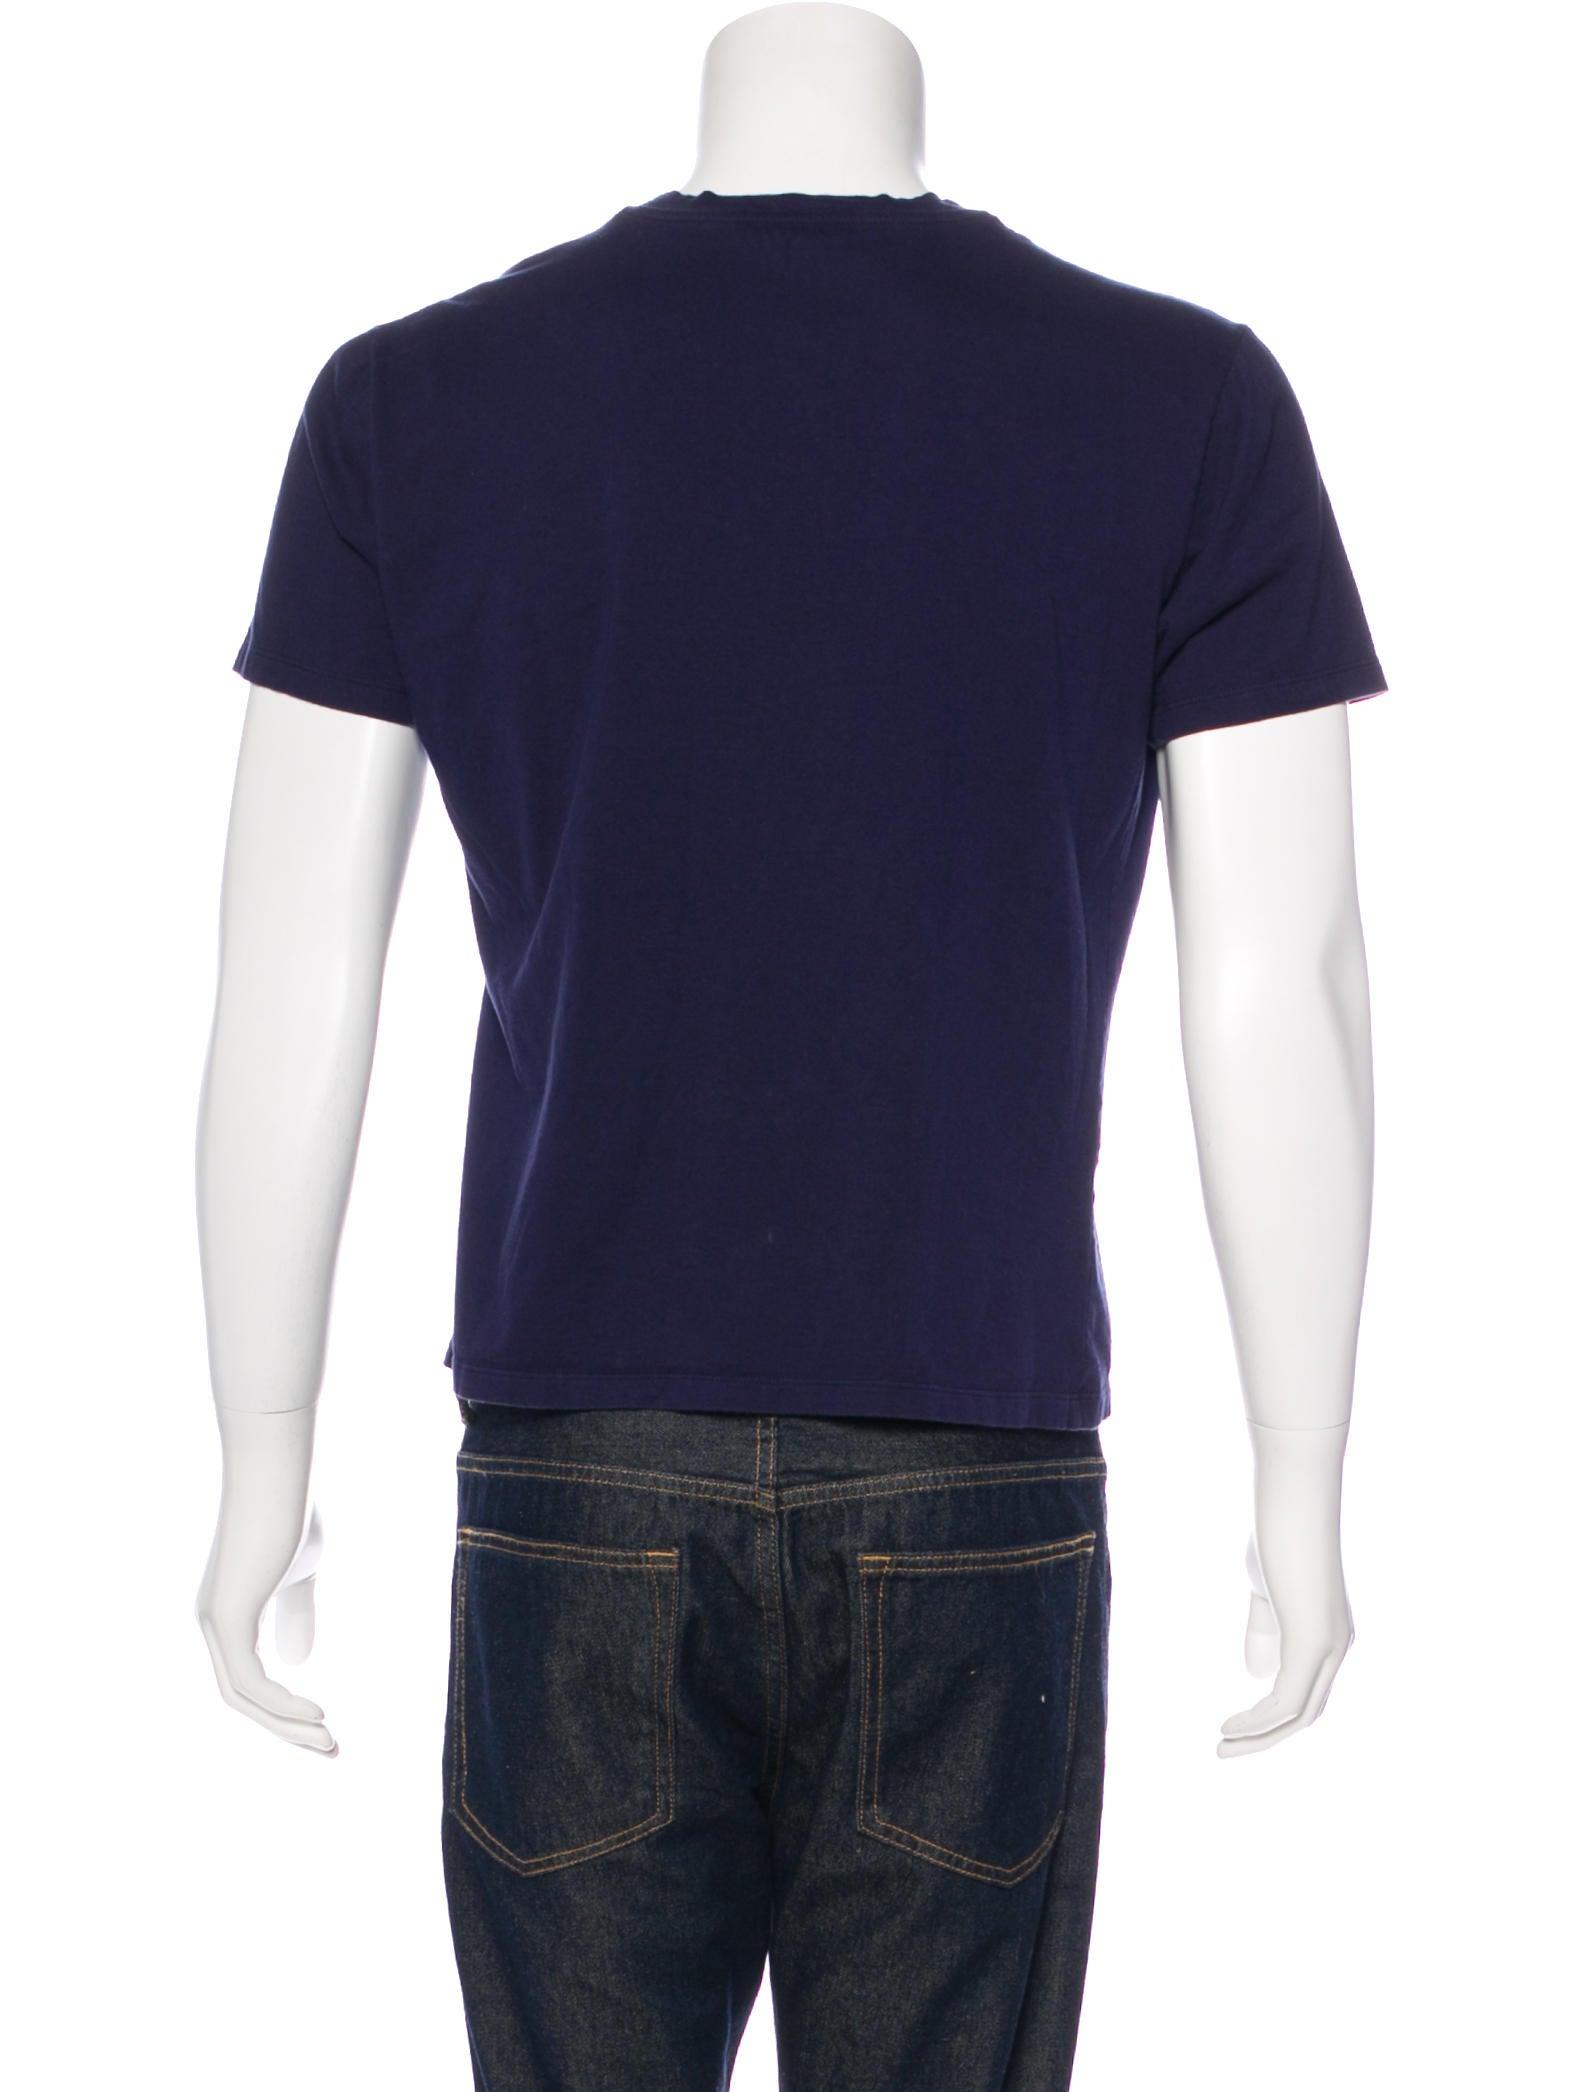 Alexander mcqueen skull graphic t shirt clothing for Alexander mcqueen shirt men